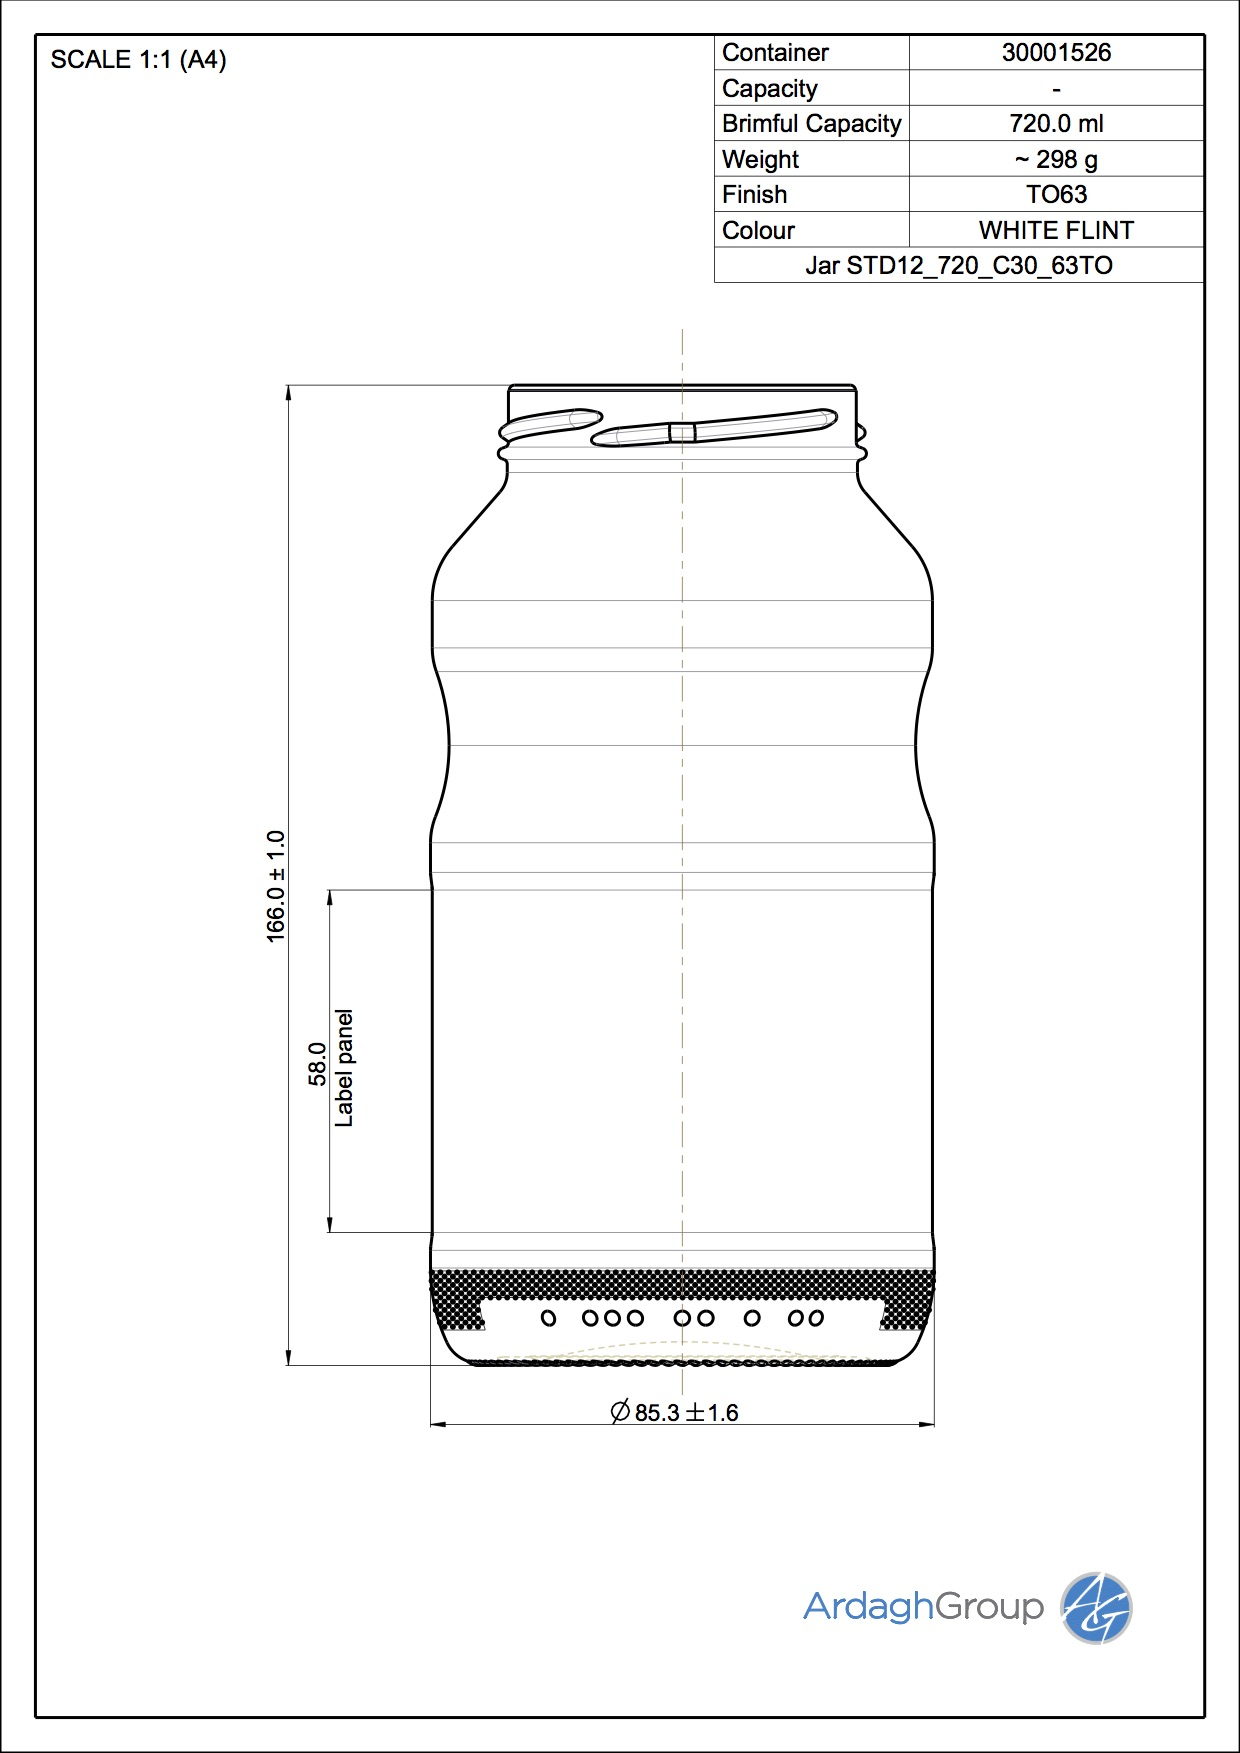 Jar STD12 720 C30 63TO